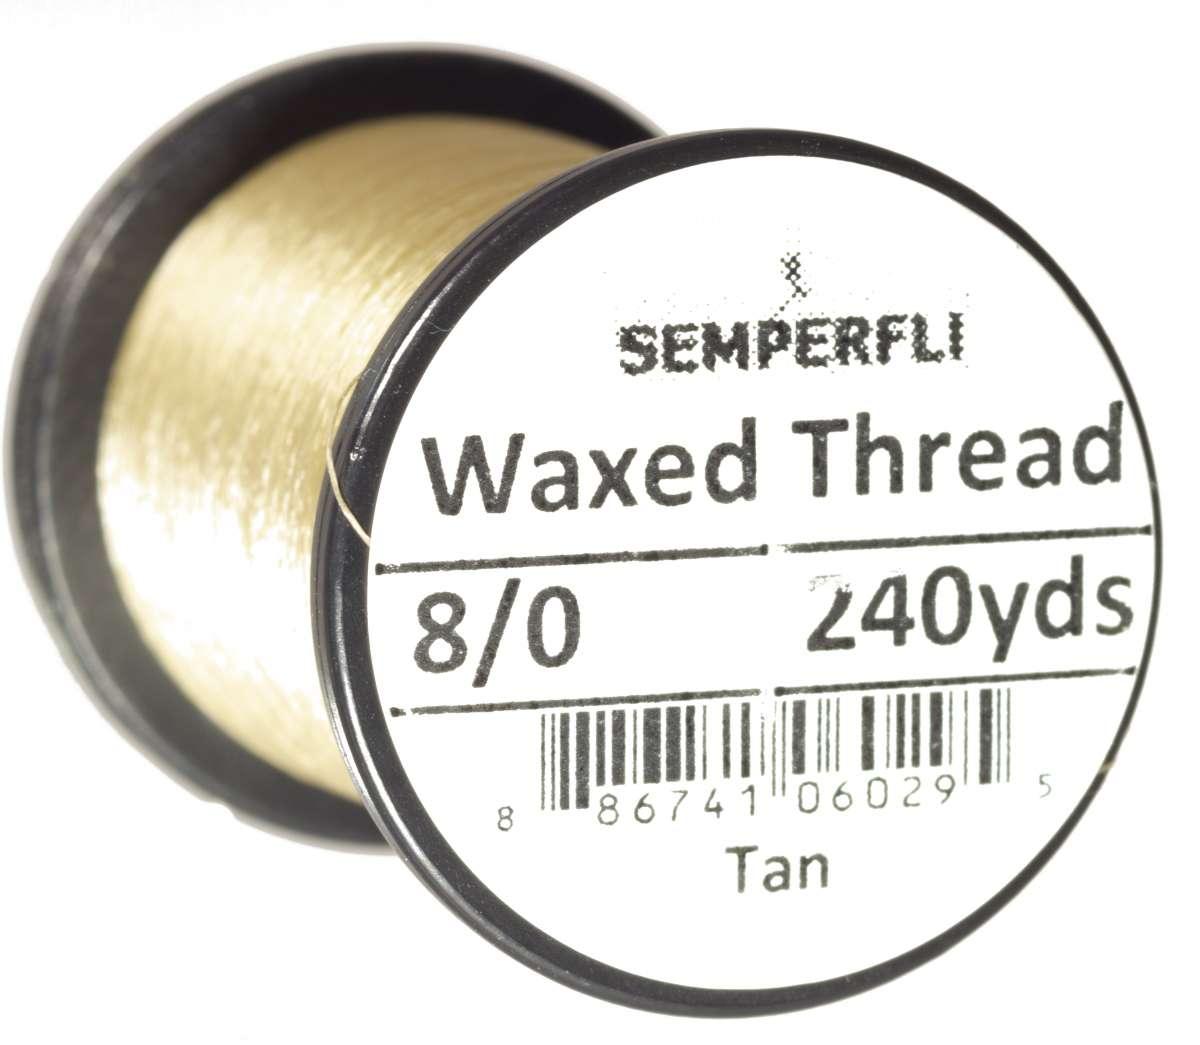 8/0 Classic Waxed Thread Tan Sem-0400-1536